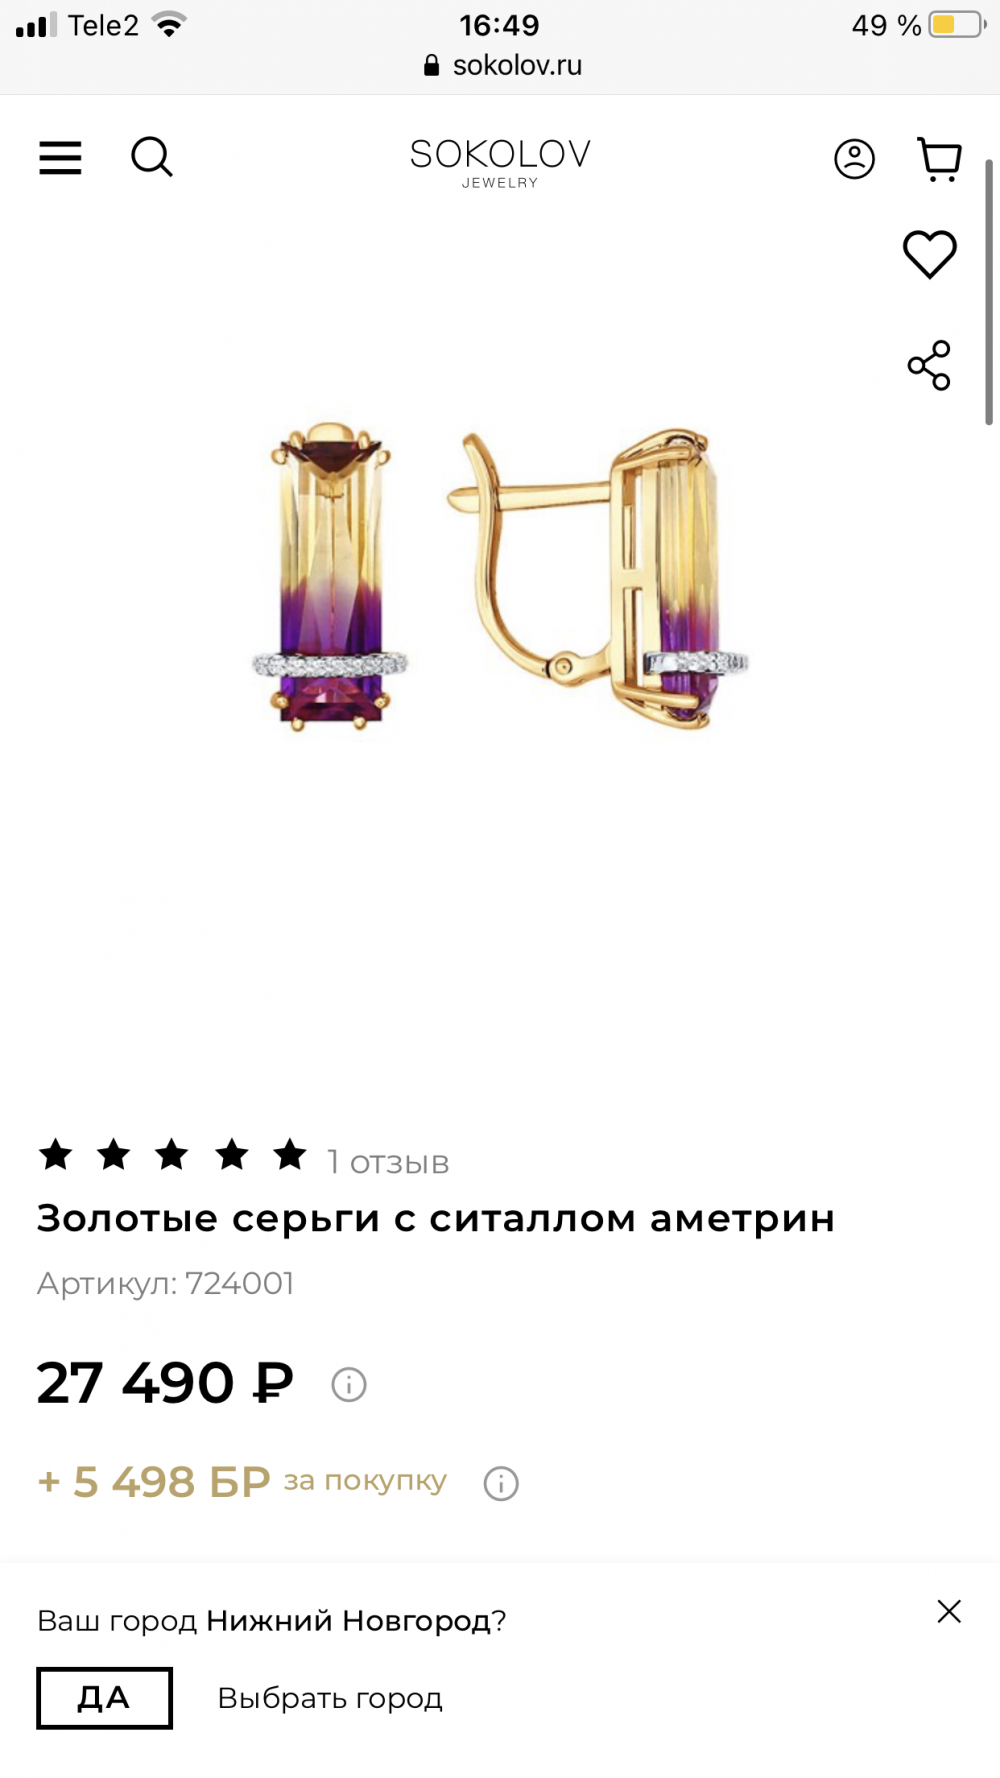 Золотые серьги SOKOLOV с ситаллом аметрин, 3.13гр